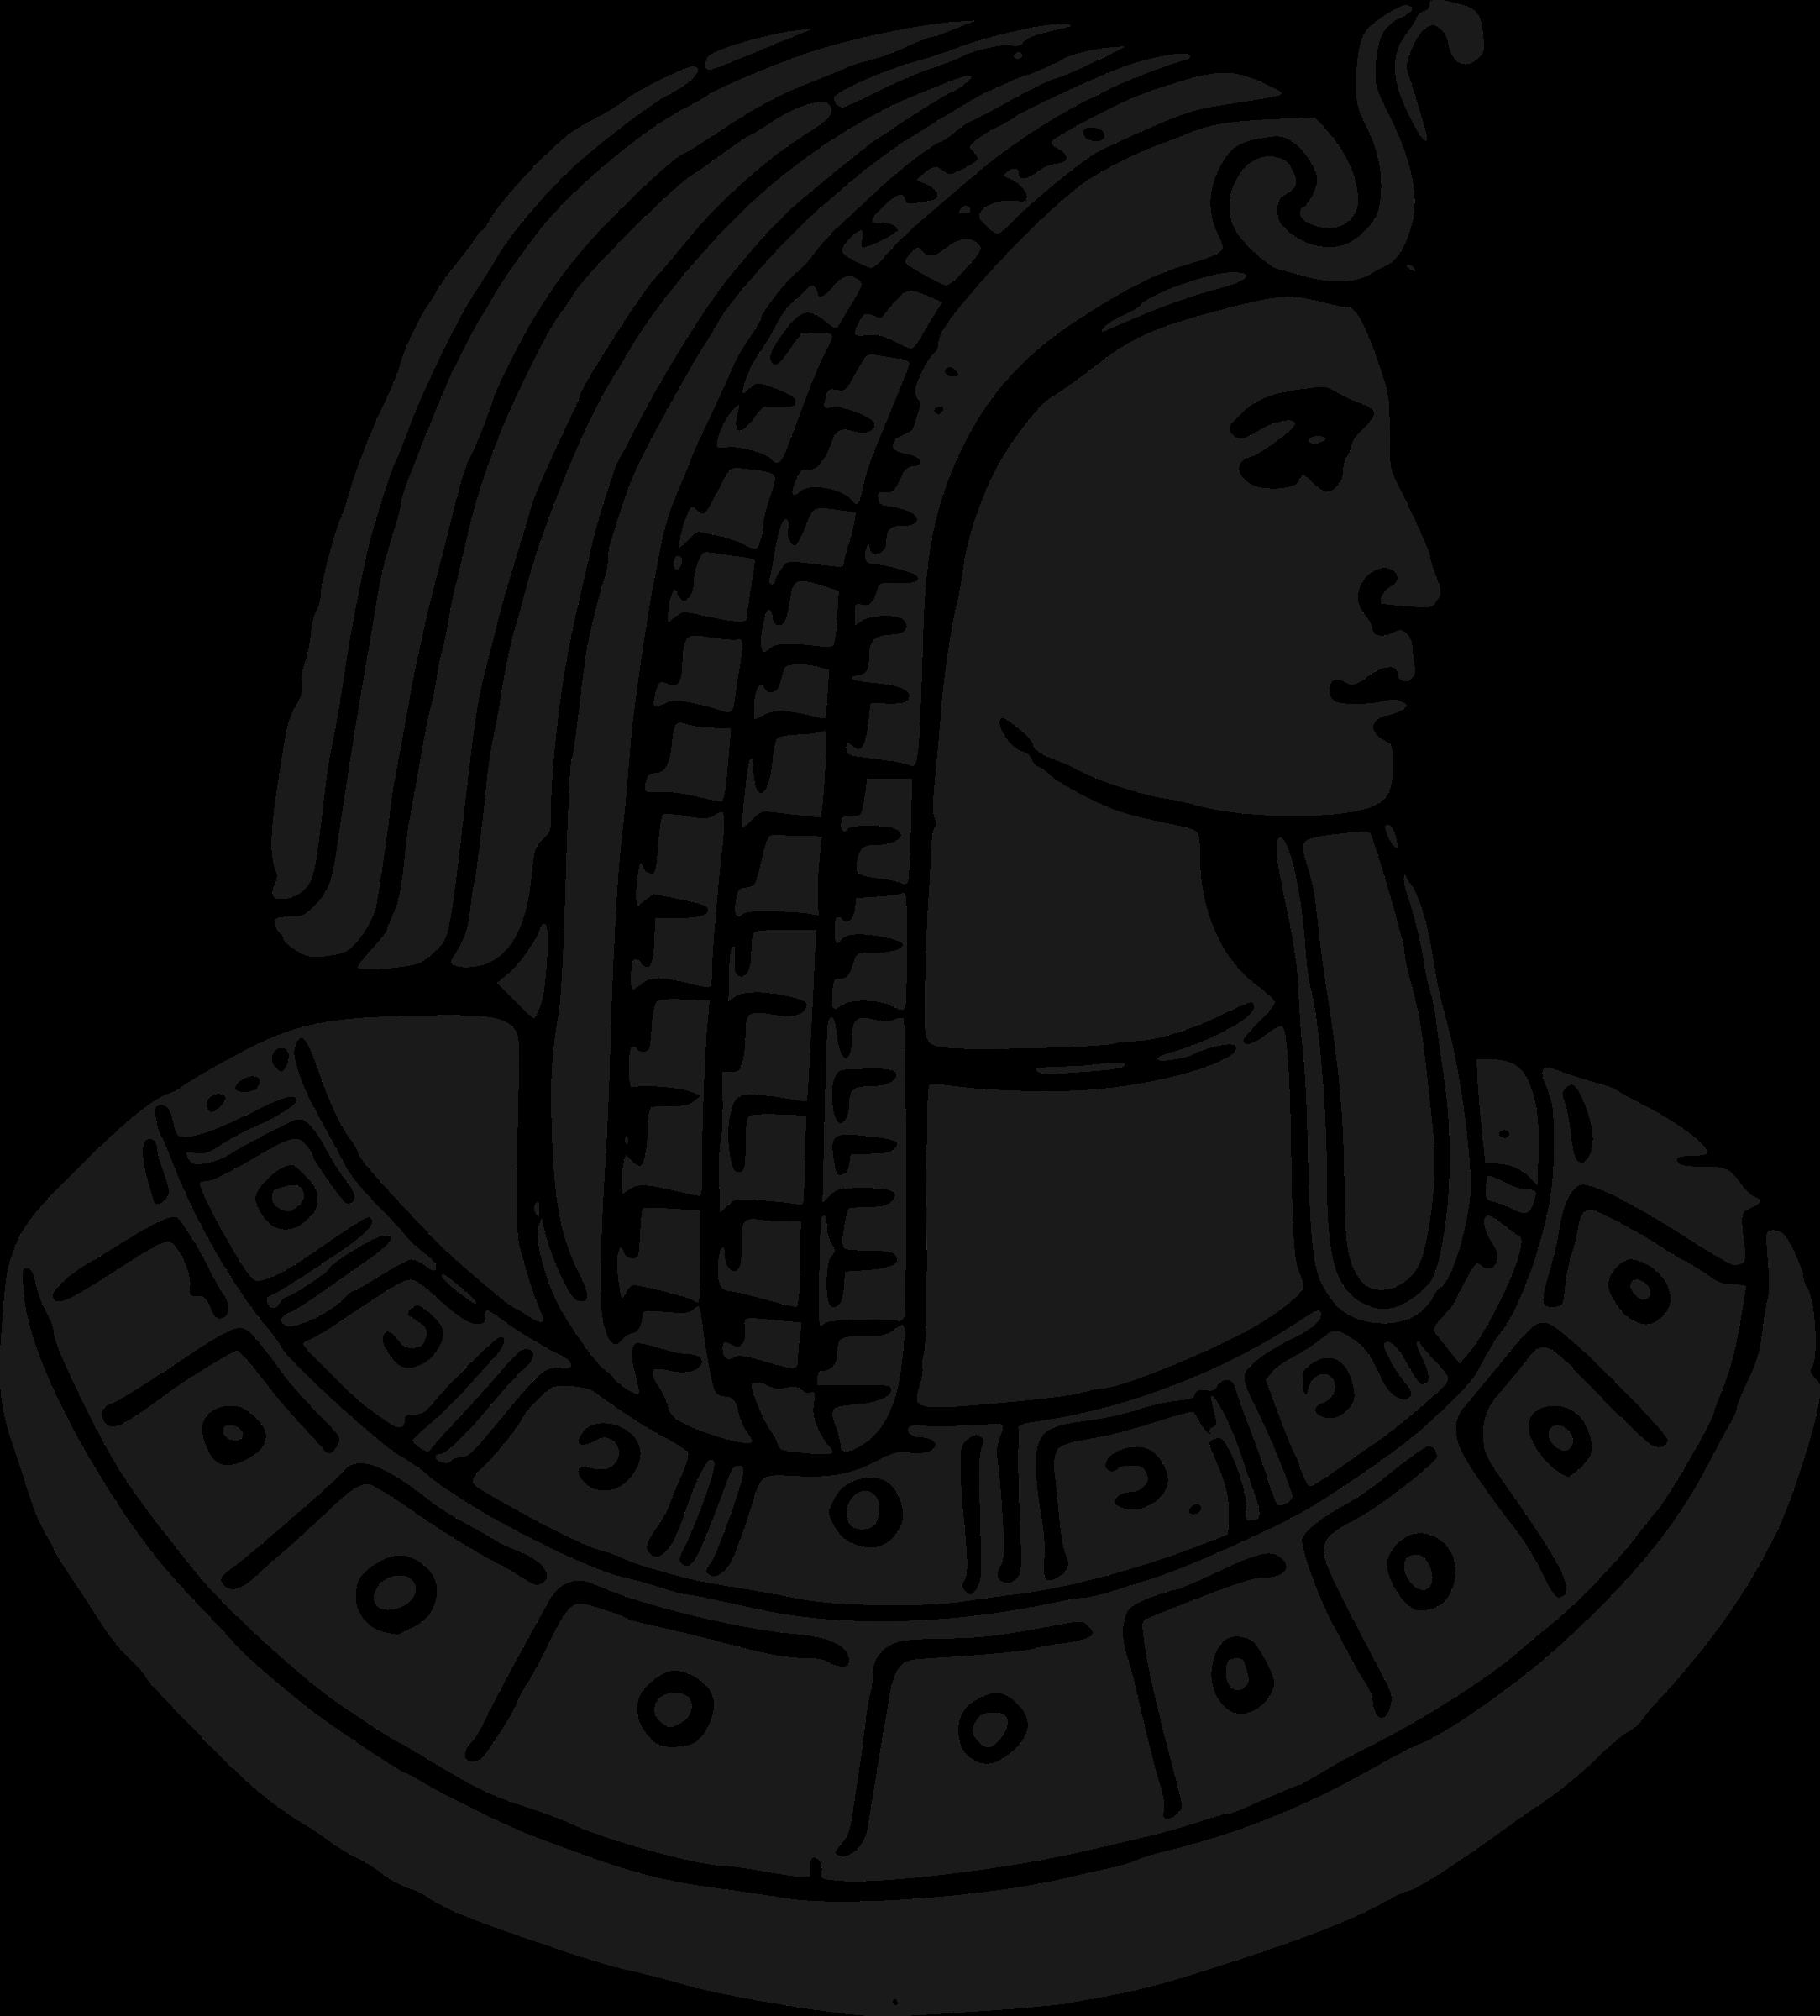 graphic royalty free stock King tut clipart. Pharaoh big image png